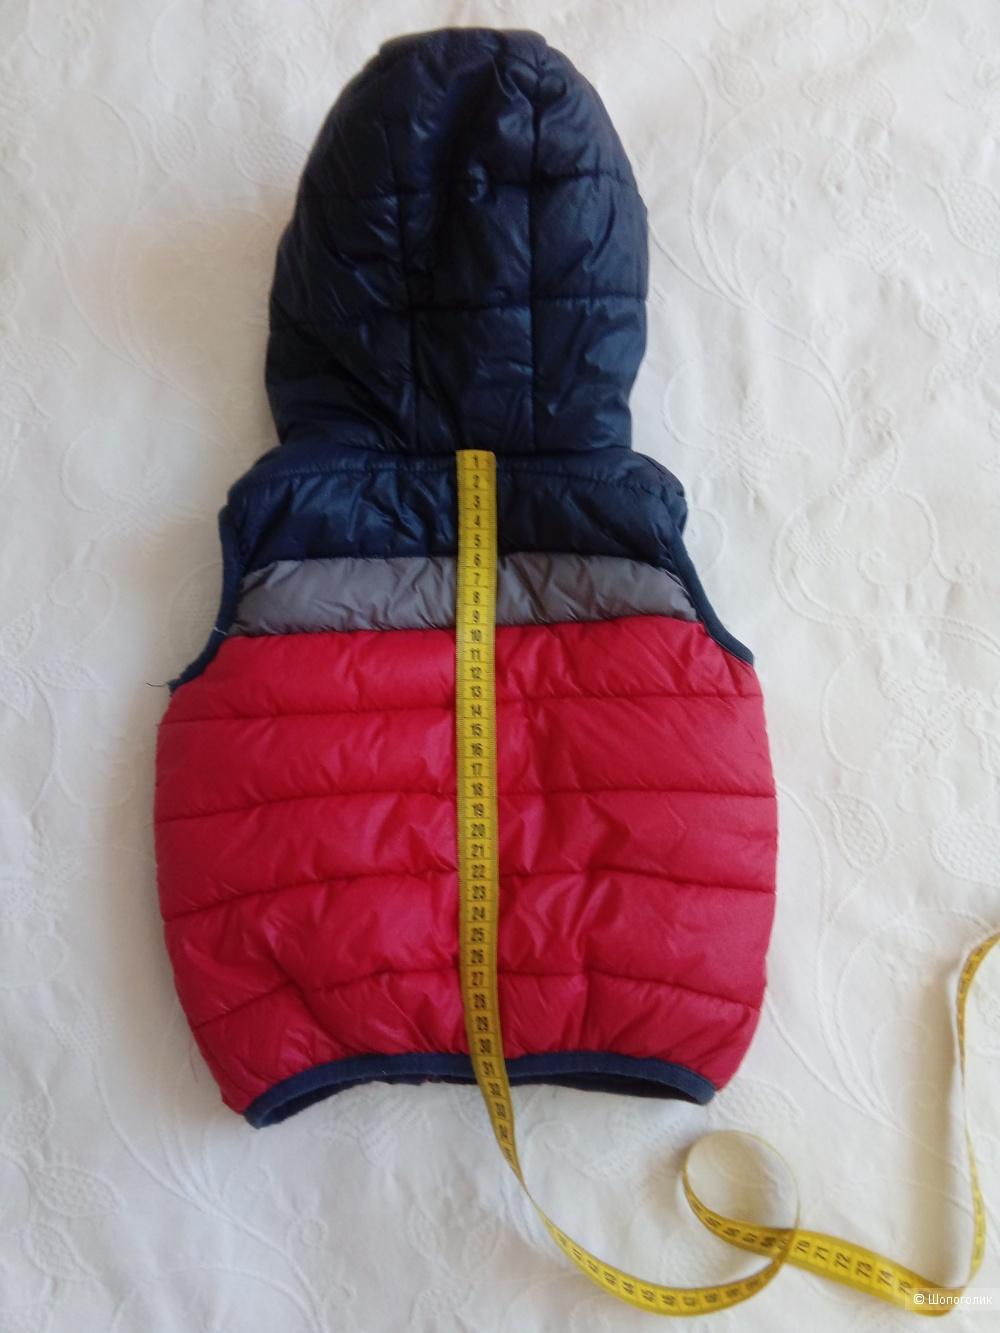 Теплый жилет на синтепоне на ребенка Moncler  размер М